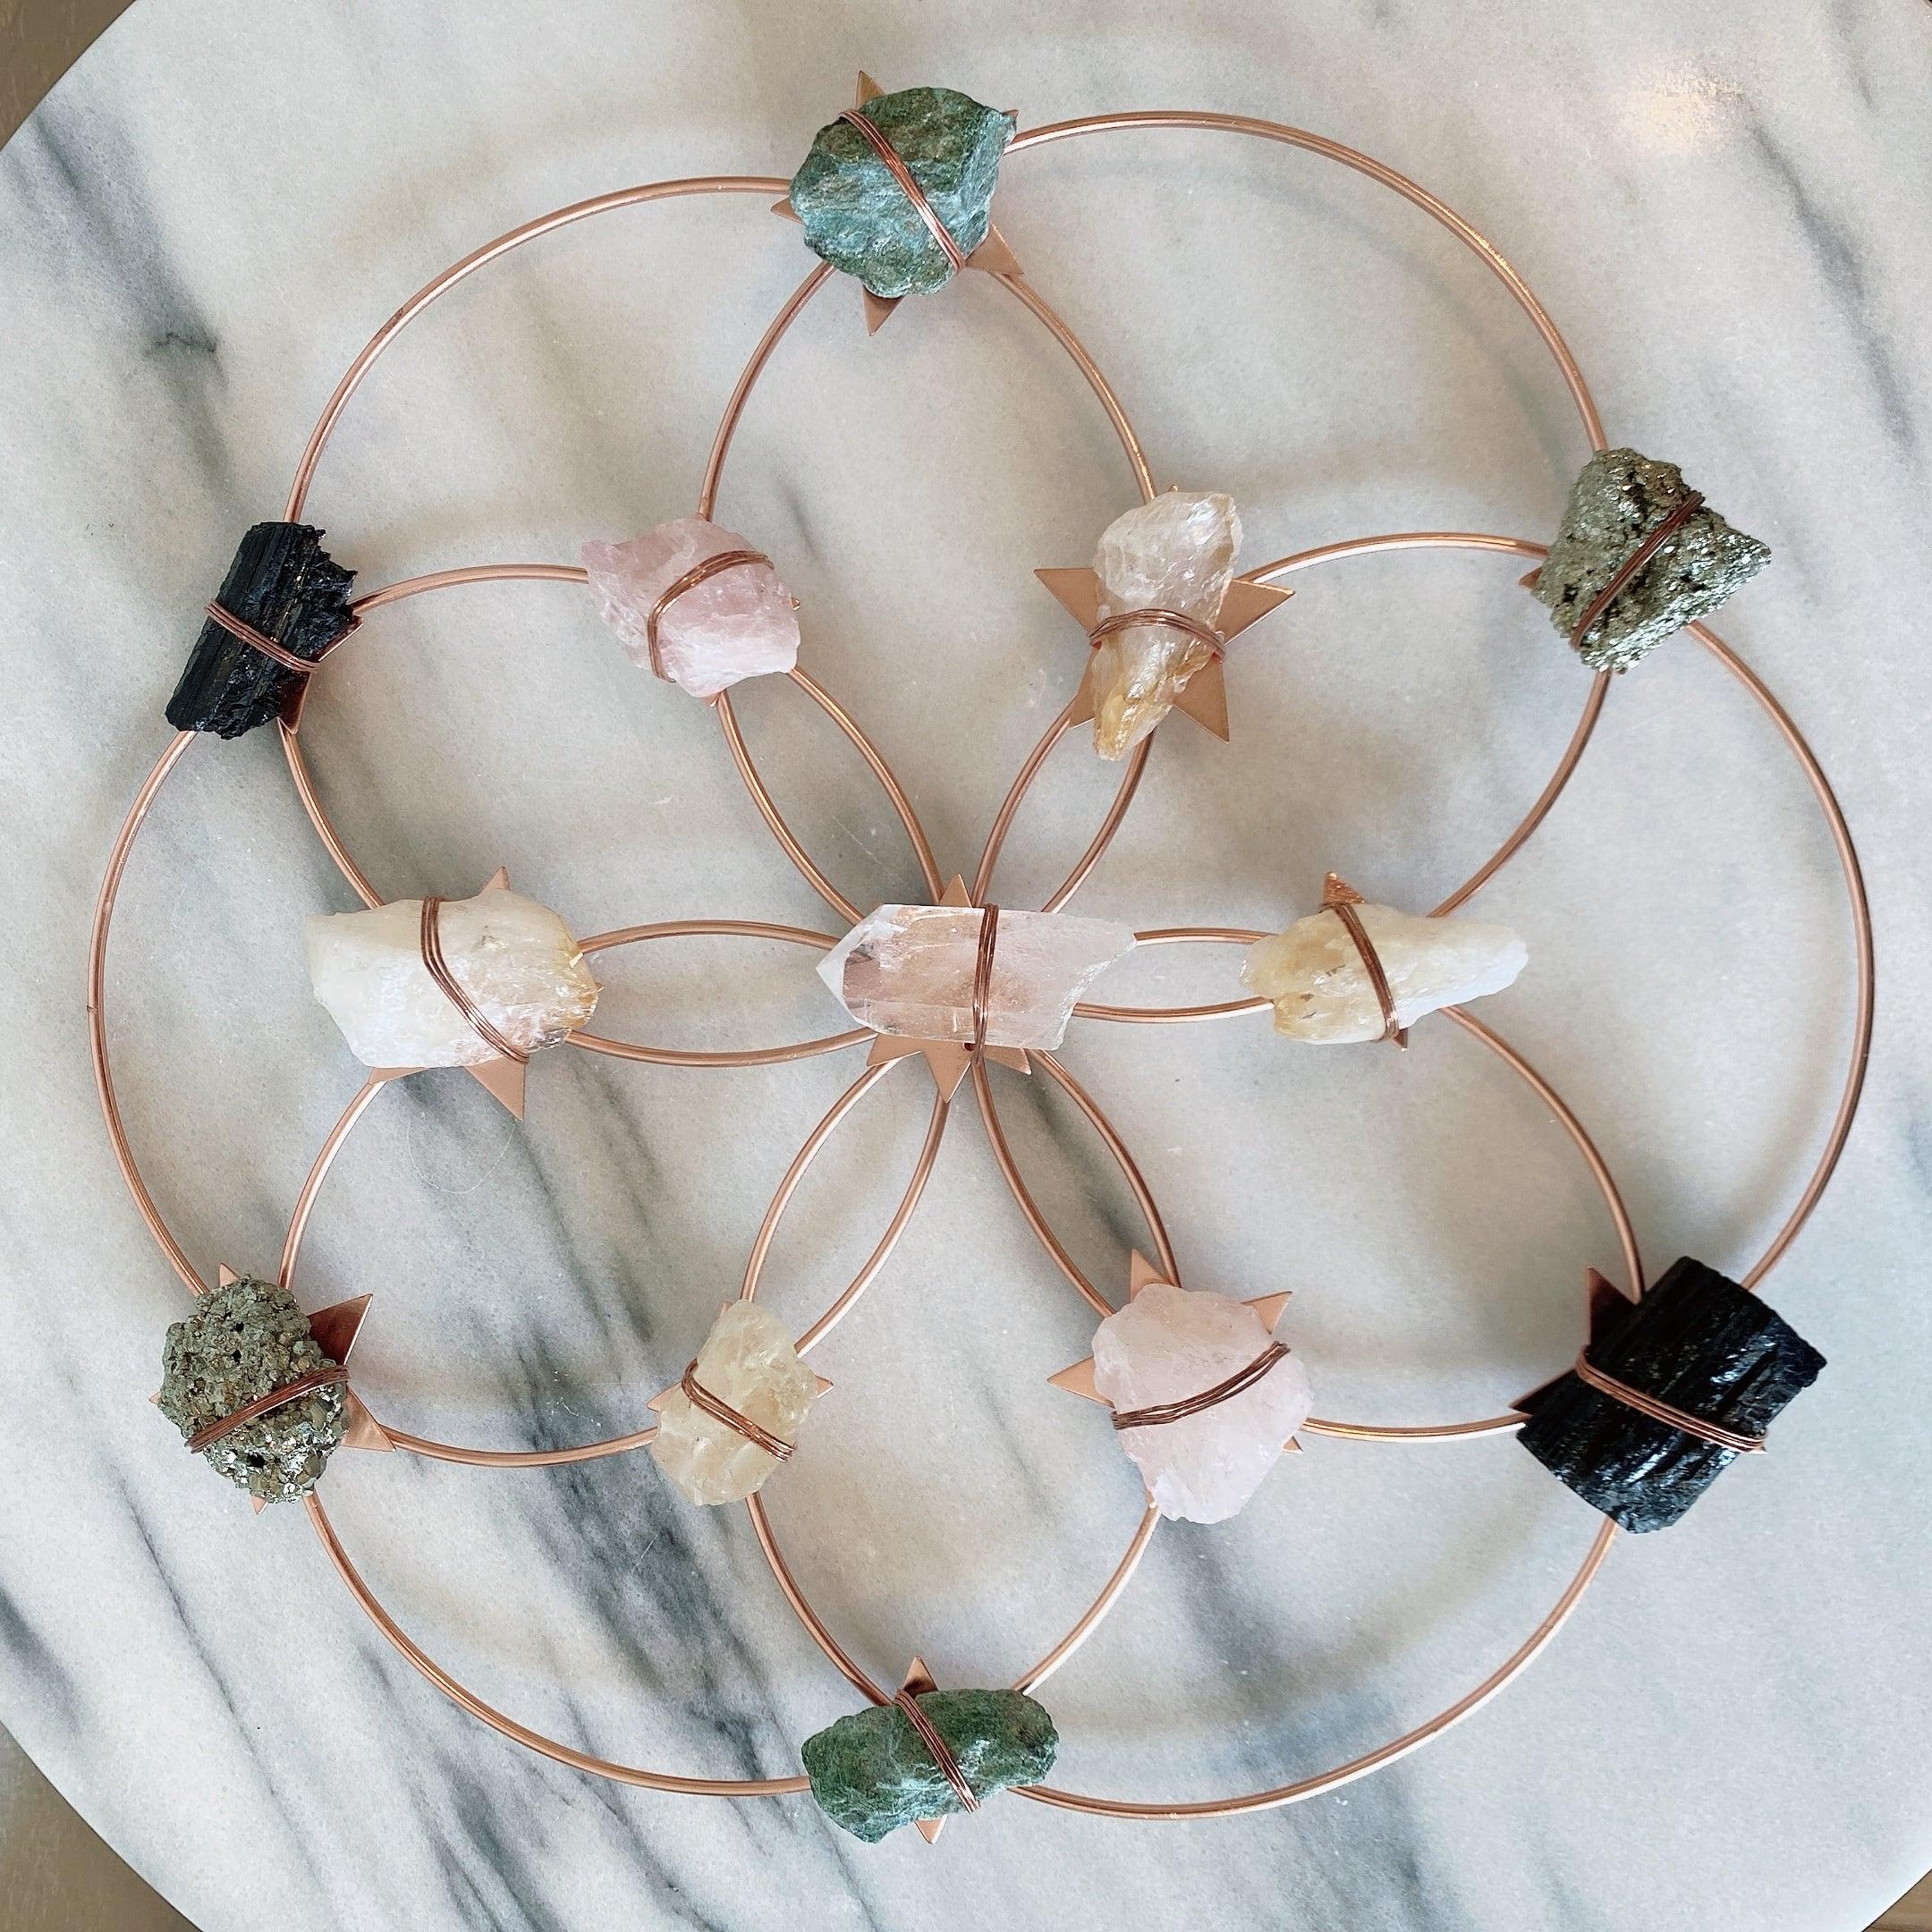 Ariana Ost Flower Of Life Healing Crystal Grid - Rose Gold Rainbow - Large クリスタルグリッド フラワーオブライフ ローズゴールド